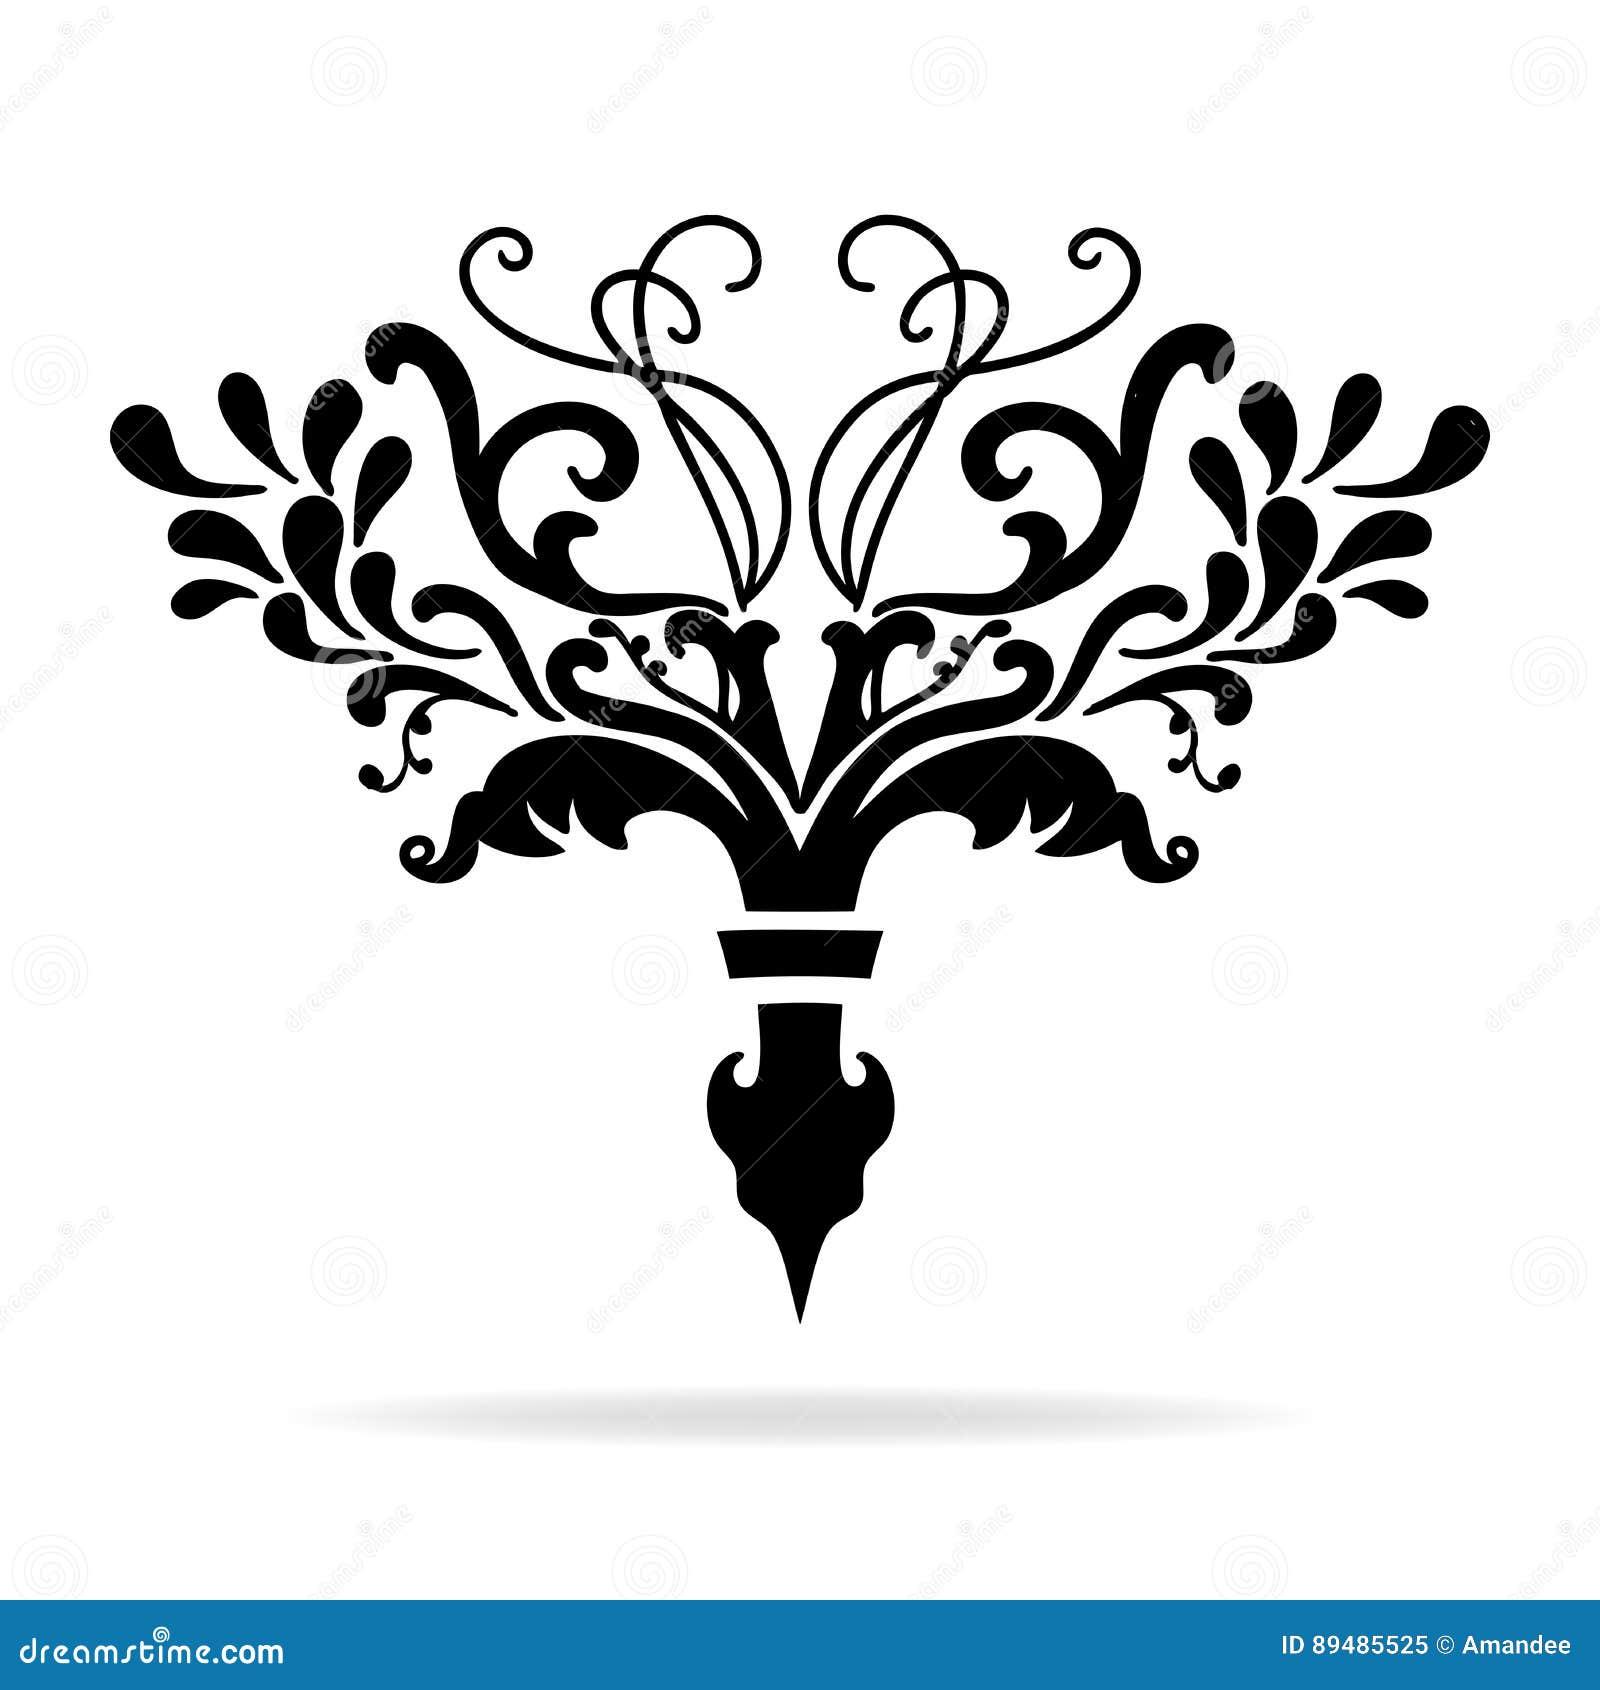 Fancy Fleur De Lis Chapter Or Text Divider Design With Vines And